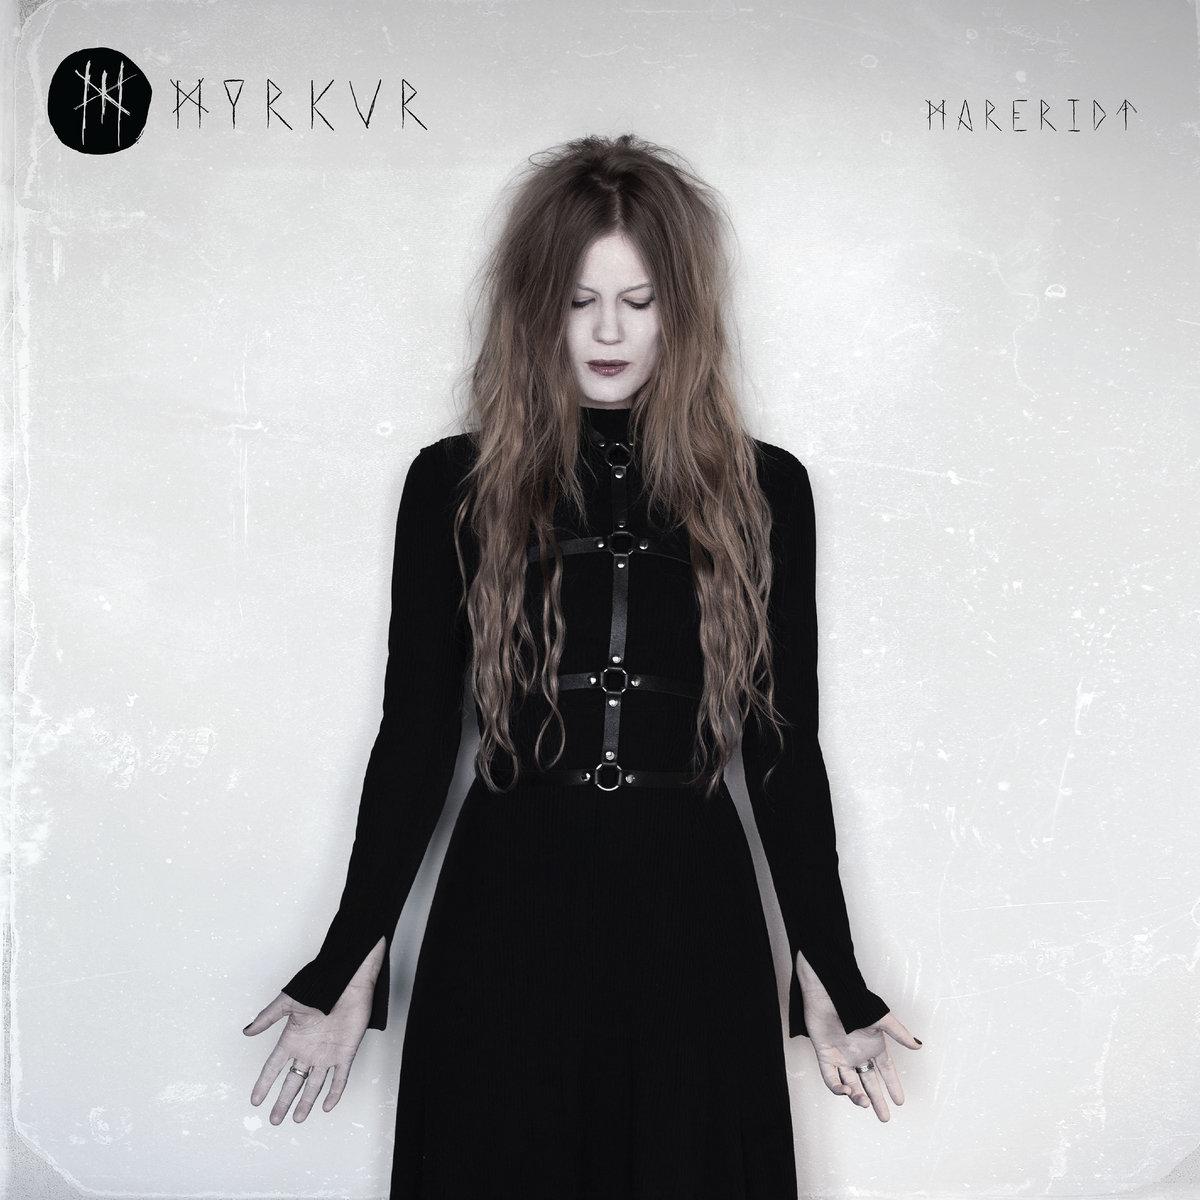 recensione-myrkur-mareridt-2017